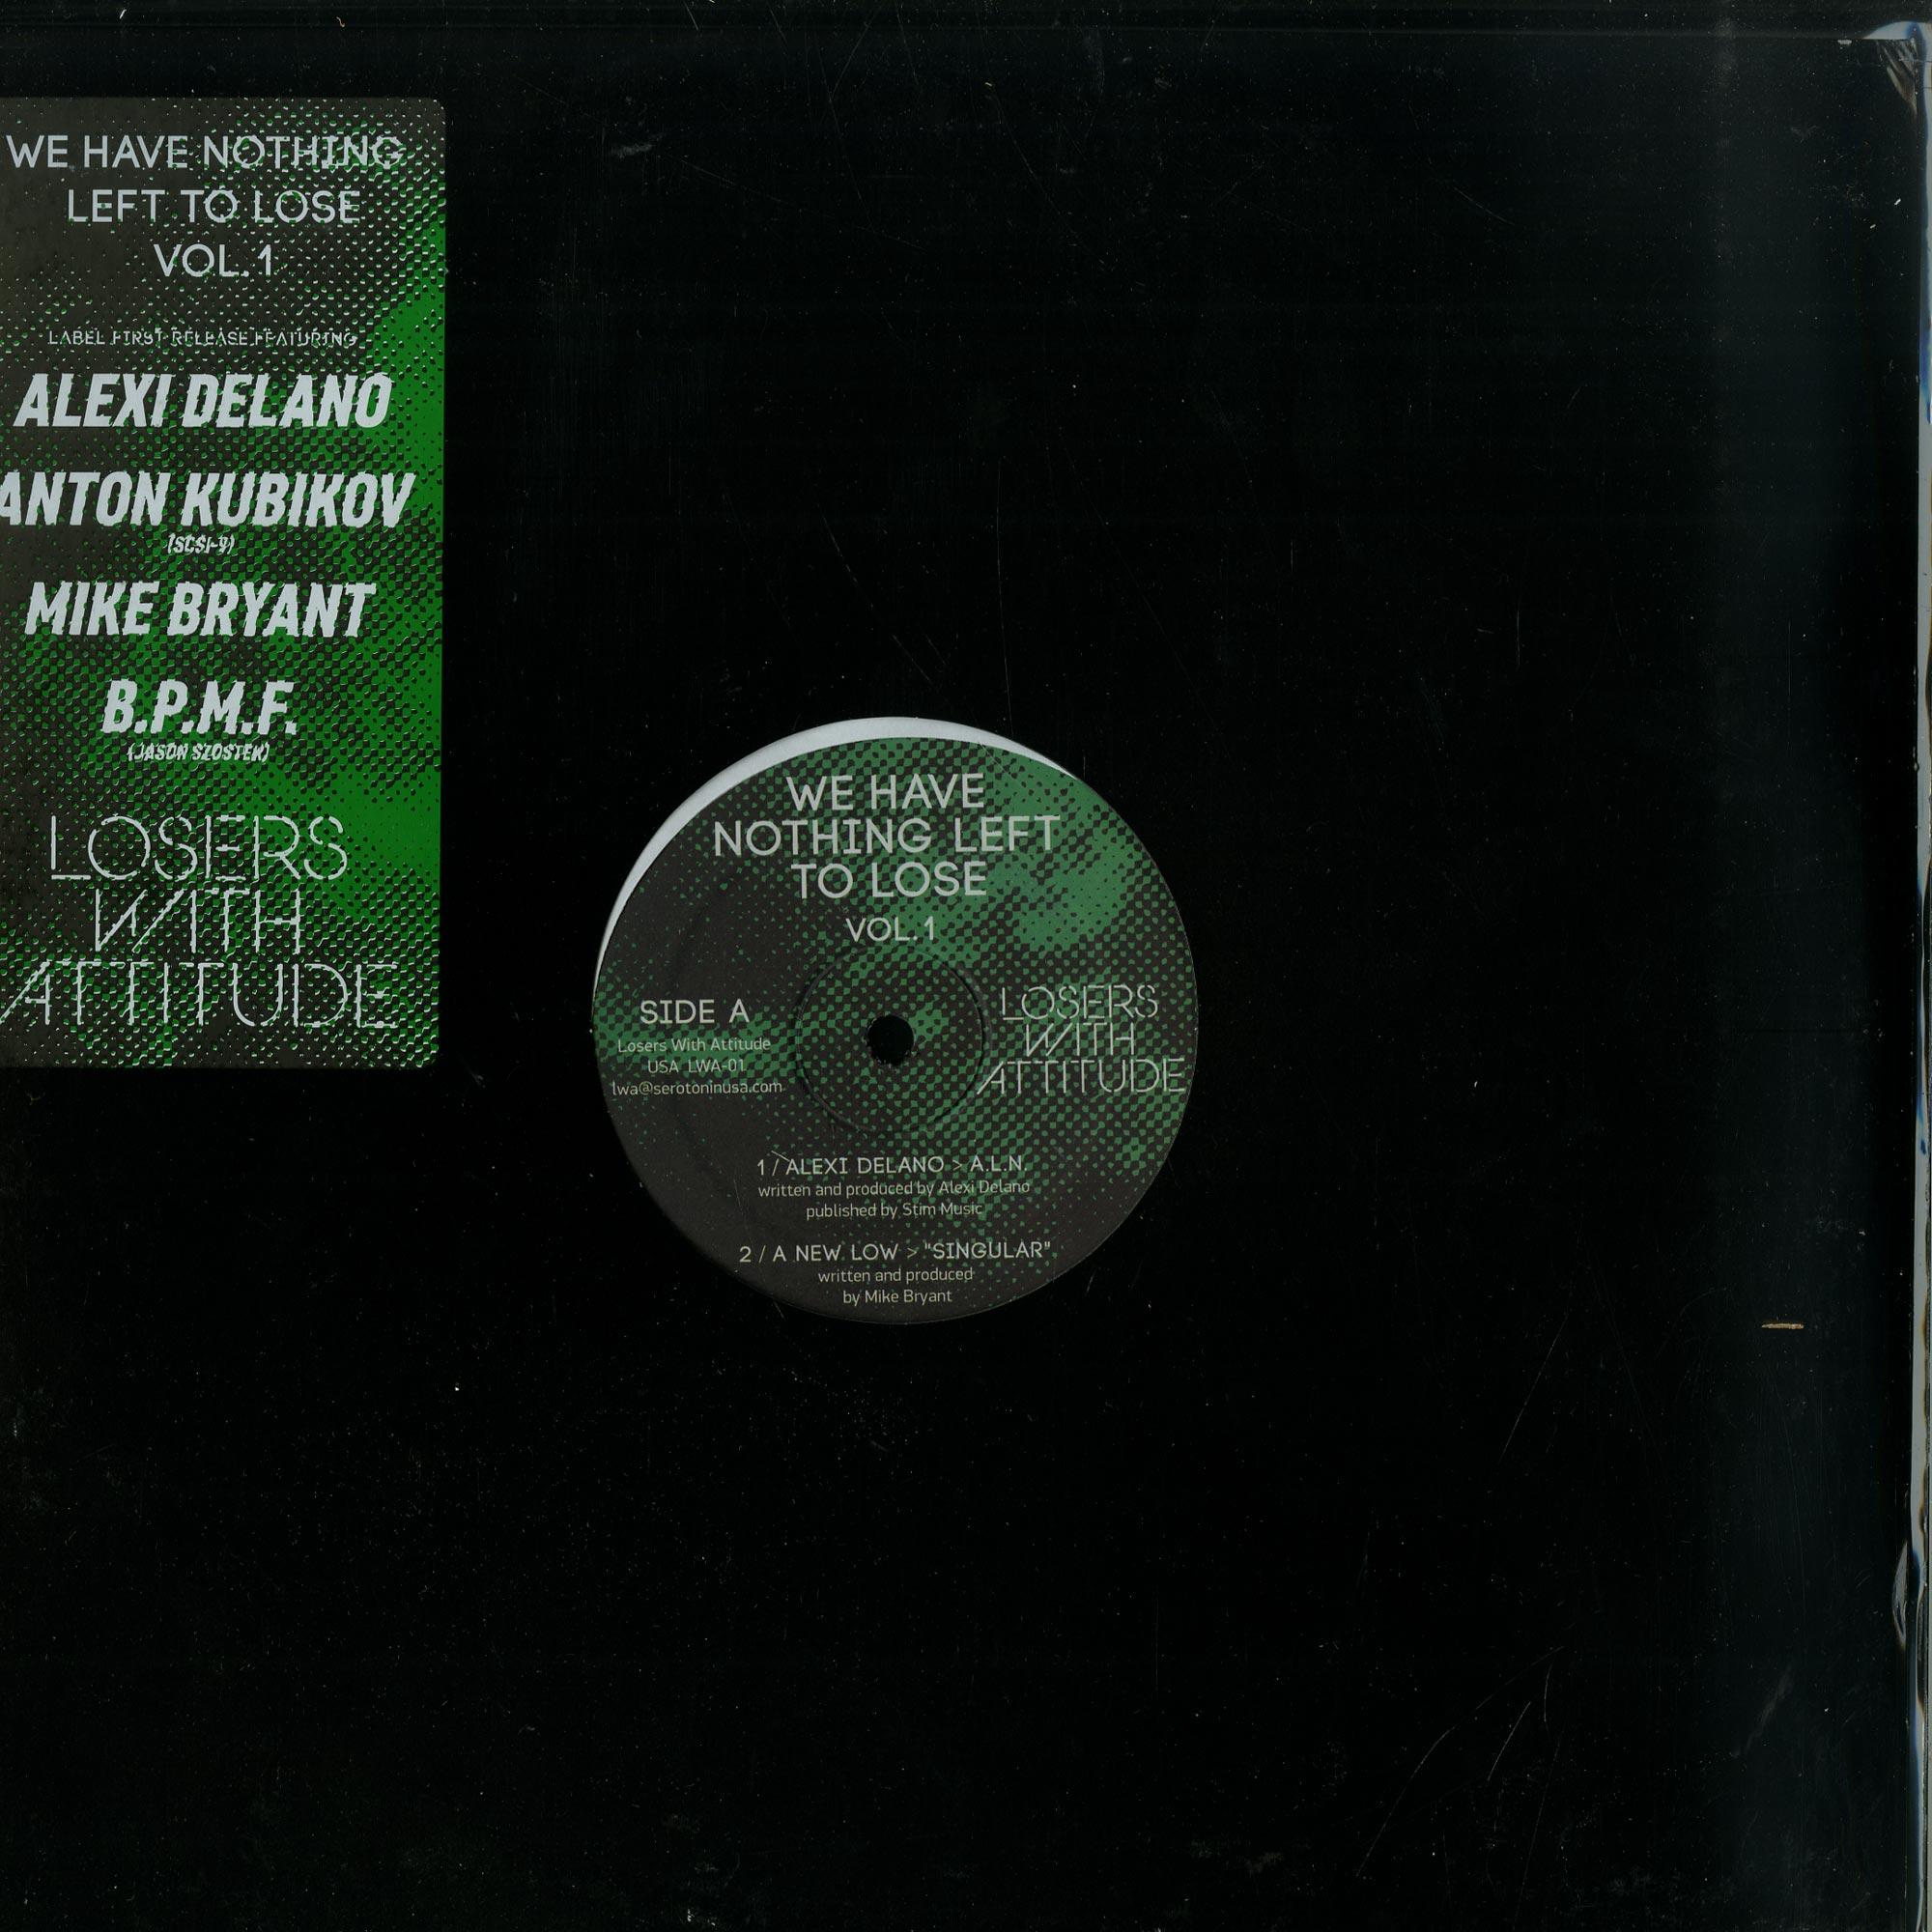 Various / Alexi Delano, Mike Bryant, BPMF, Anton Kubikov - WE HAVE NOTHING LEFT TO LOSE